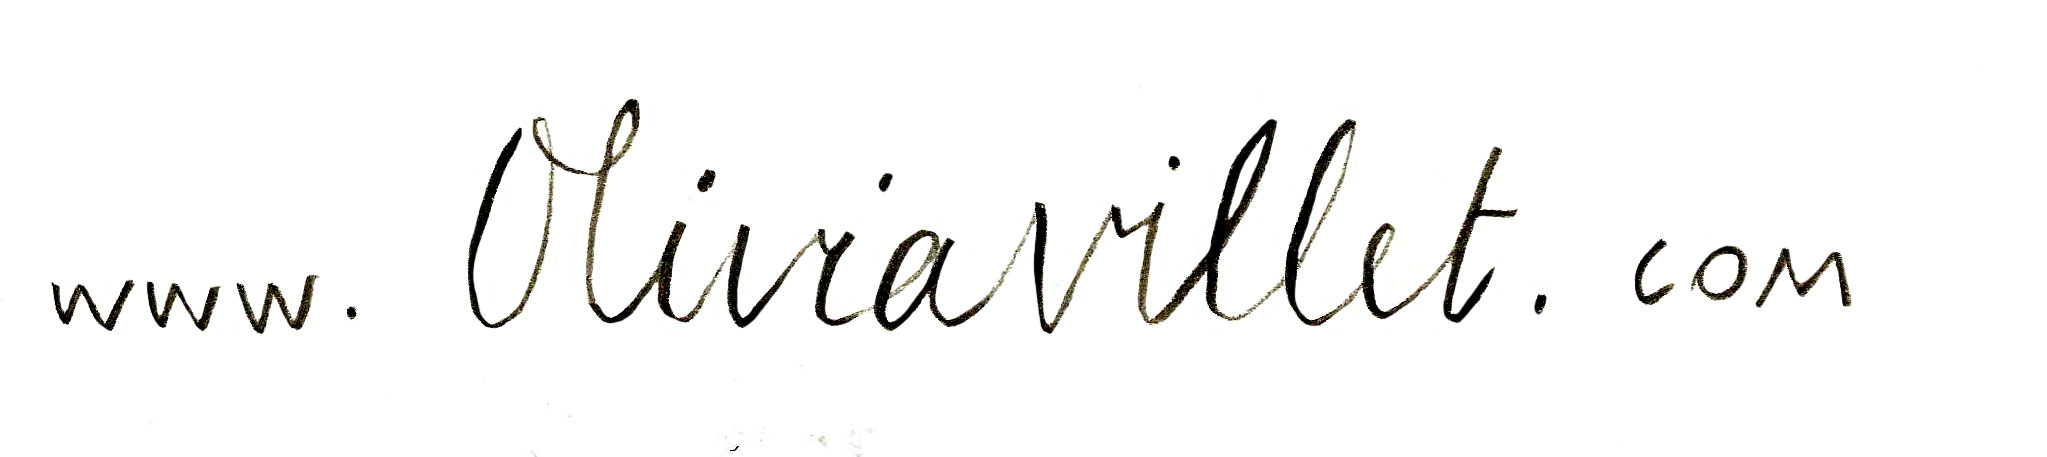 www.oliviavillet.com